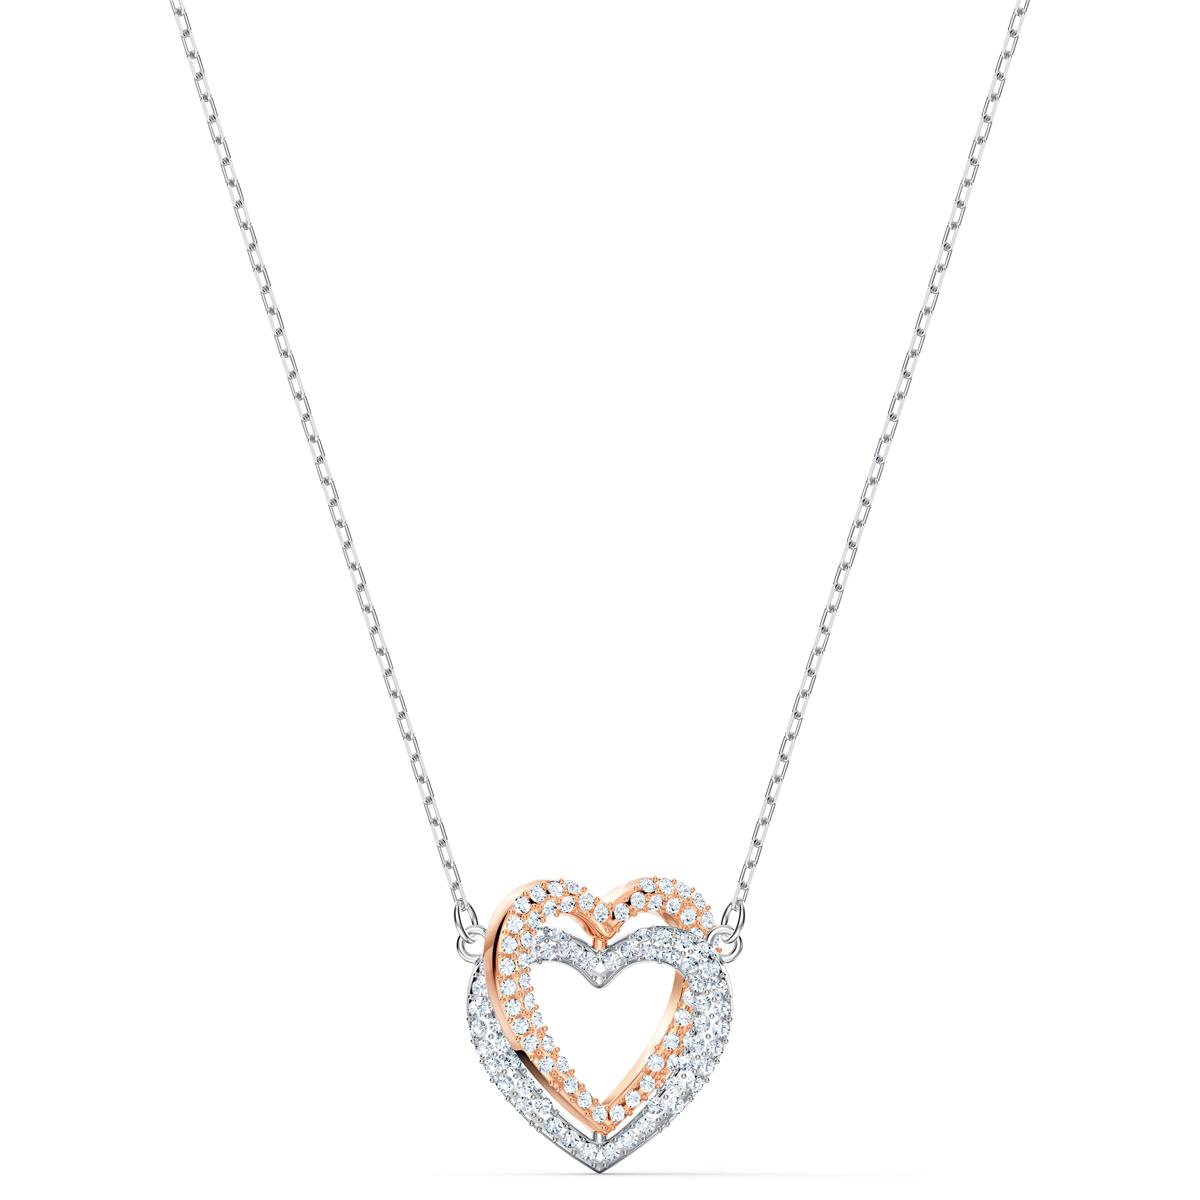 Swarovski Necklace Infinity Necklace Double Heart Crystal Mix